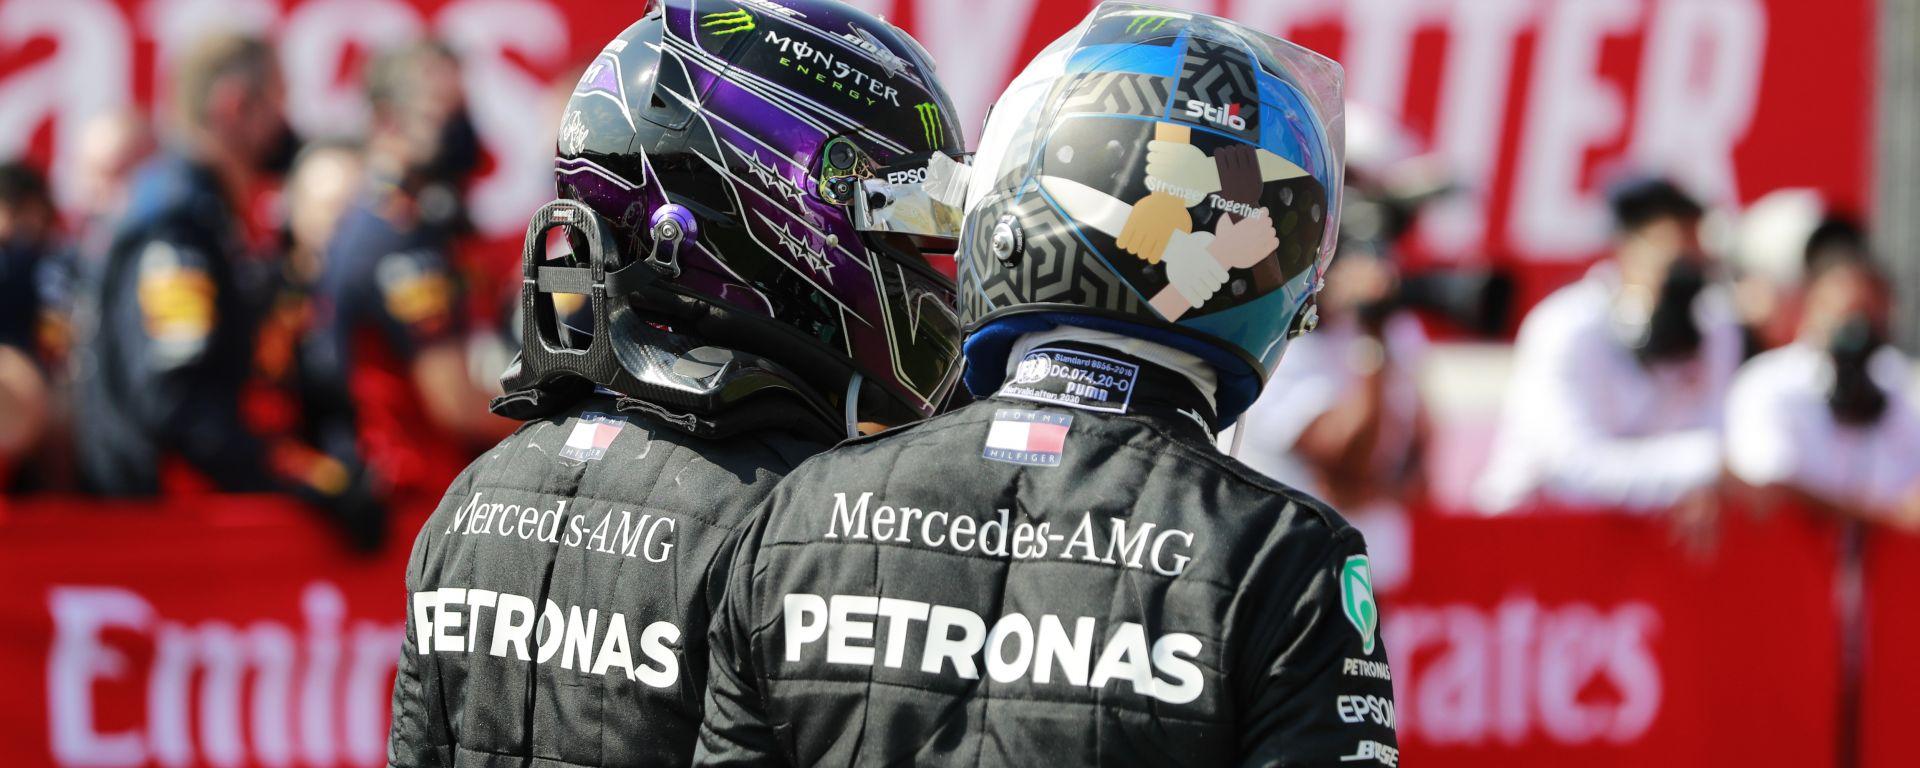 F1 2020: Lewis Hamilton e Valtteri Bottas (Mercedes)